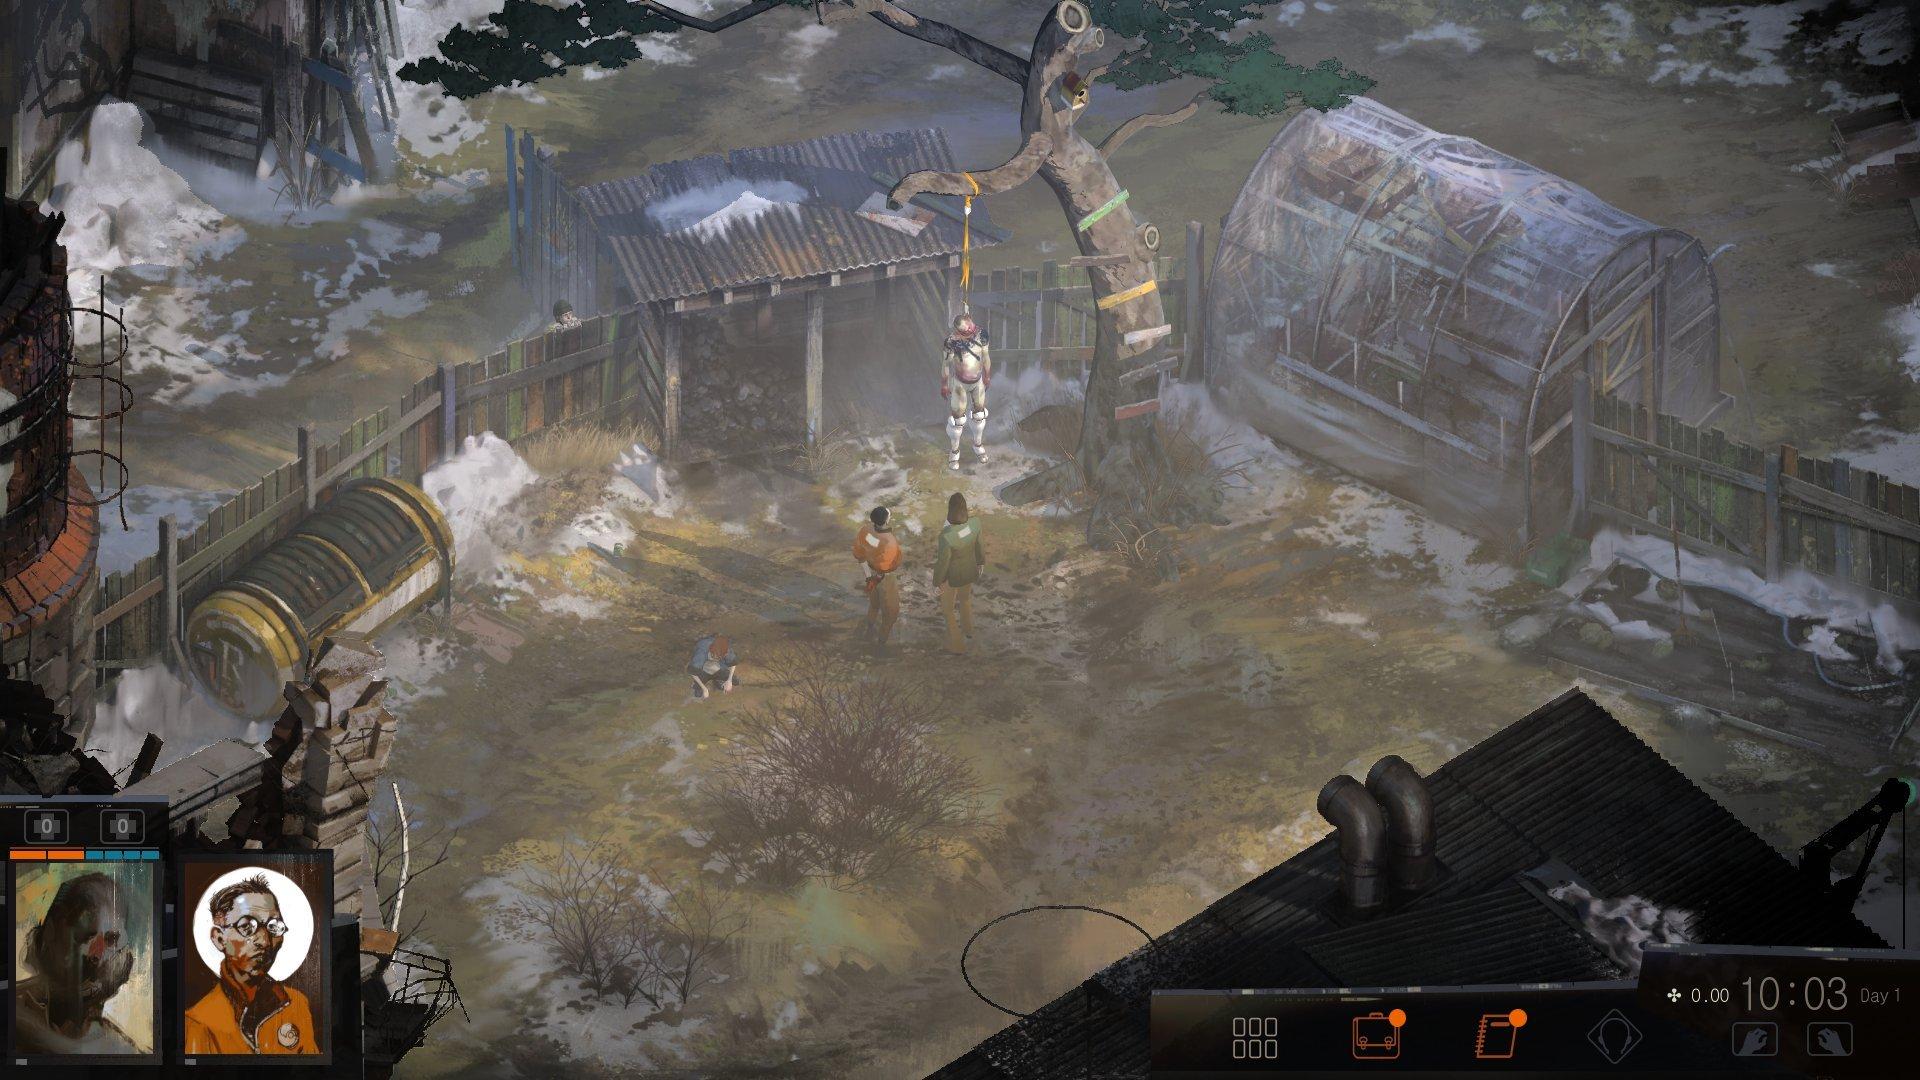 Screenshot for the game Disco Elysium-The Final Cut v.c09c4438  [GOG]